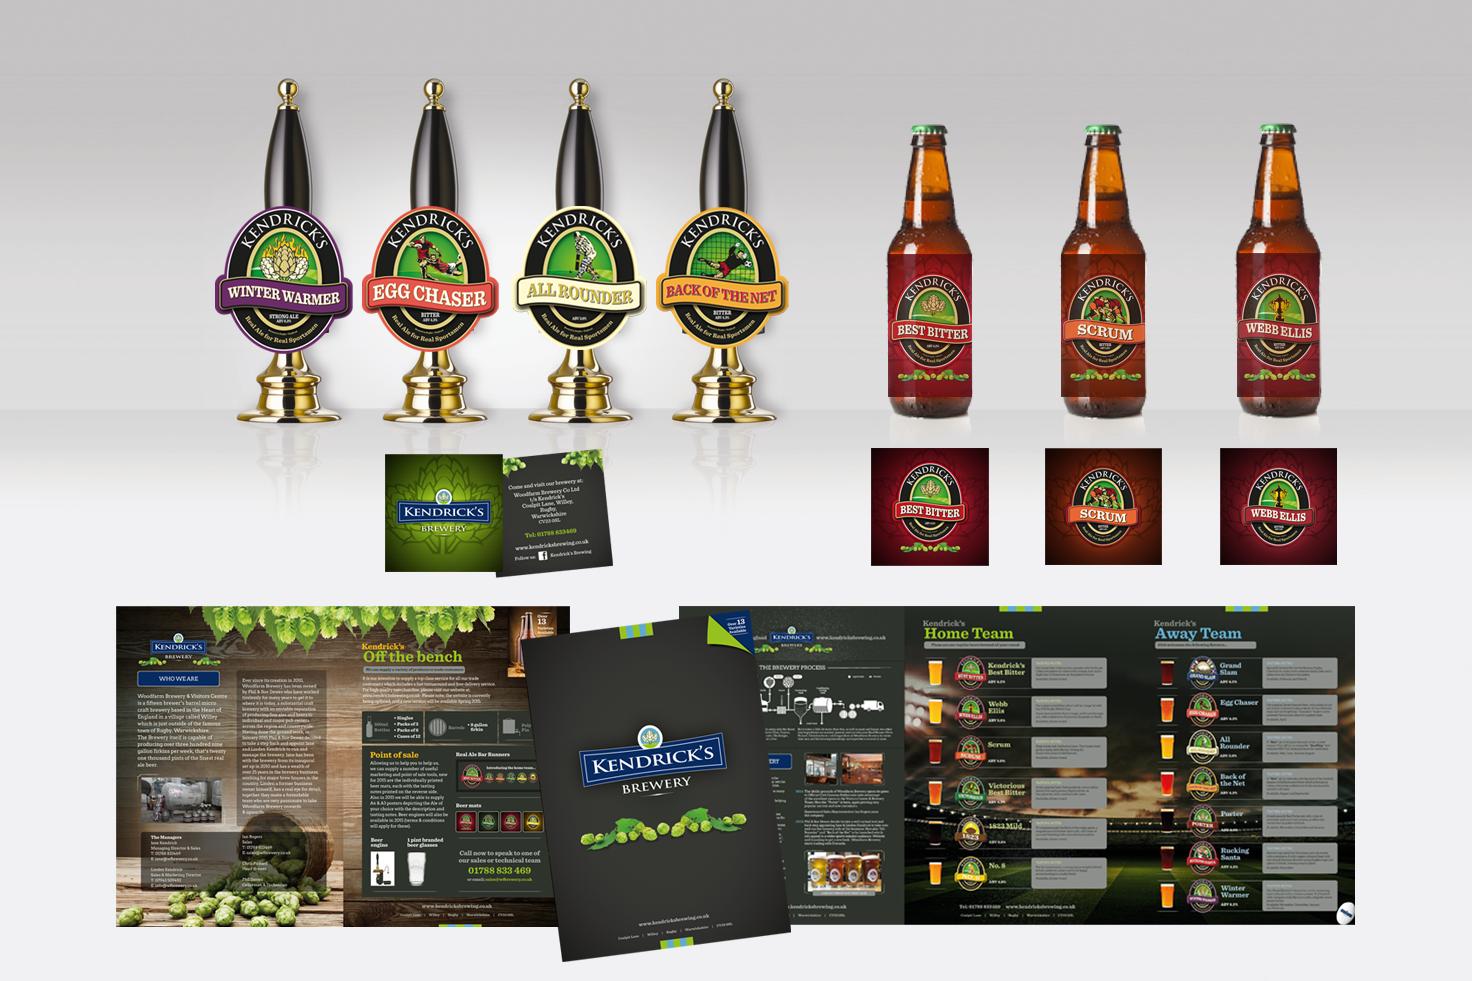 Kendrick's Brewery branding